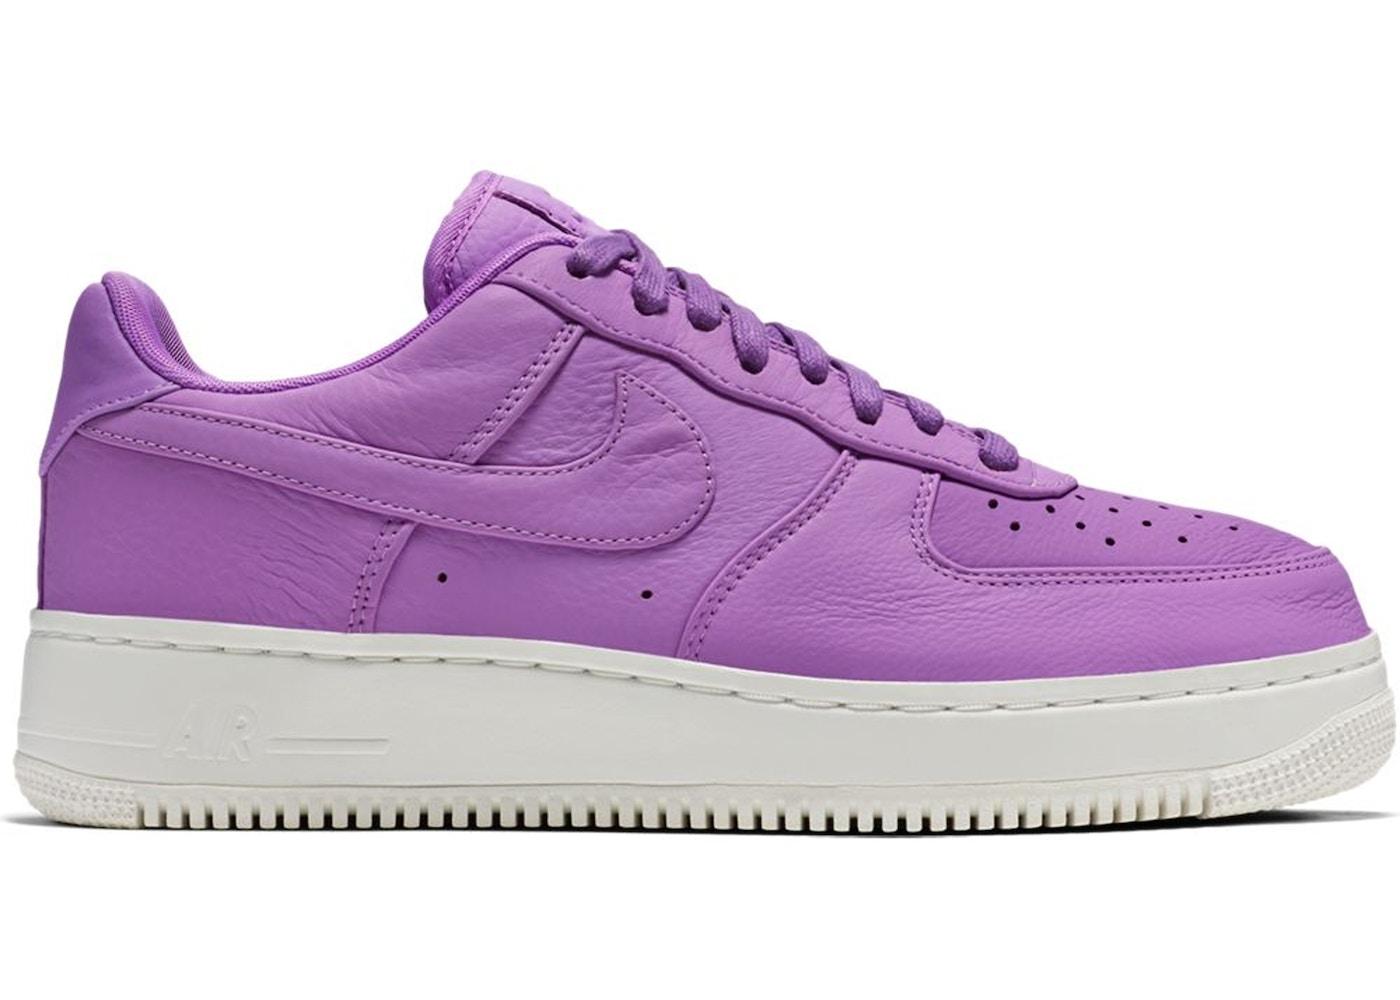 hot sales 5abfd 649d2 Air Force 1 Low Purple Stardust - 905618-500